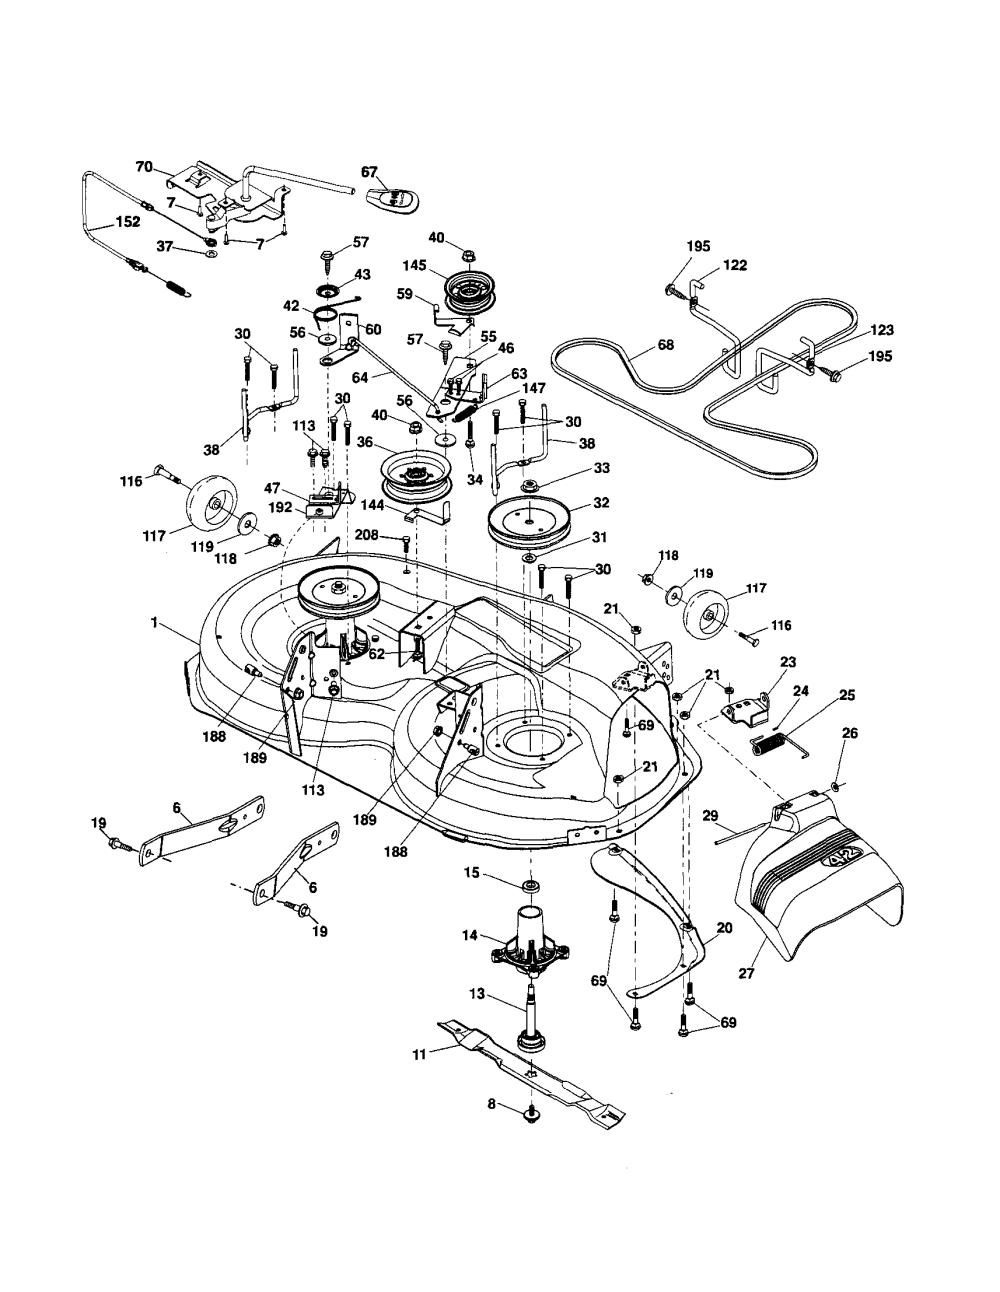 medium resolution of 116 john deere lawn tractor wiring diagram